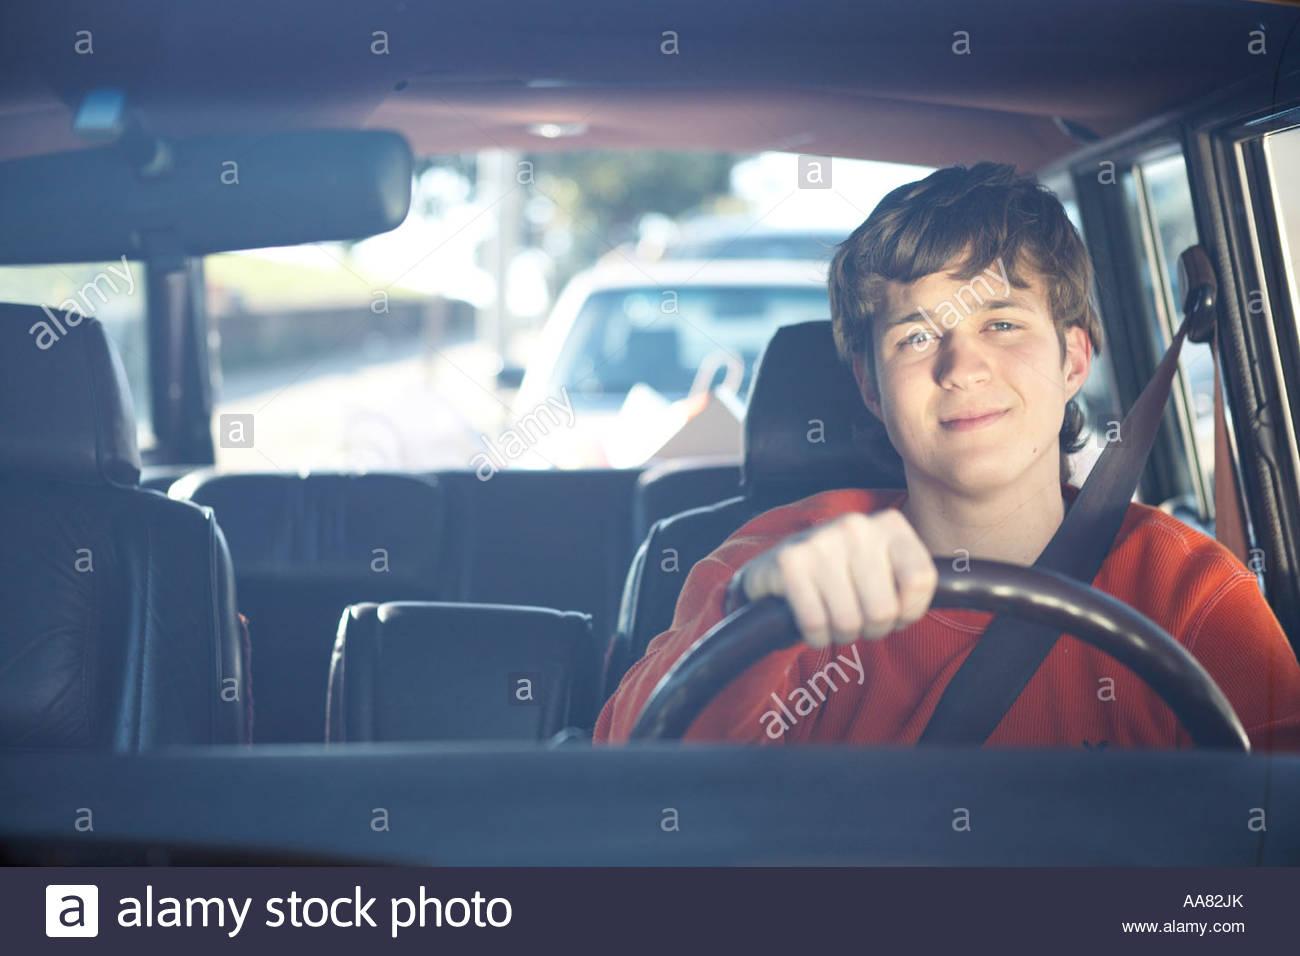 Teenage boy driving car - Stock Image